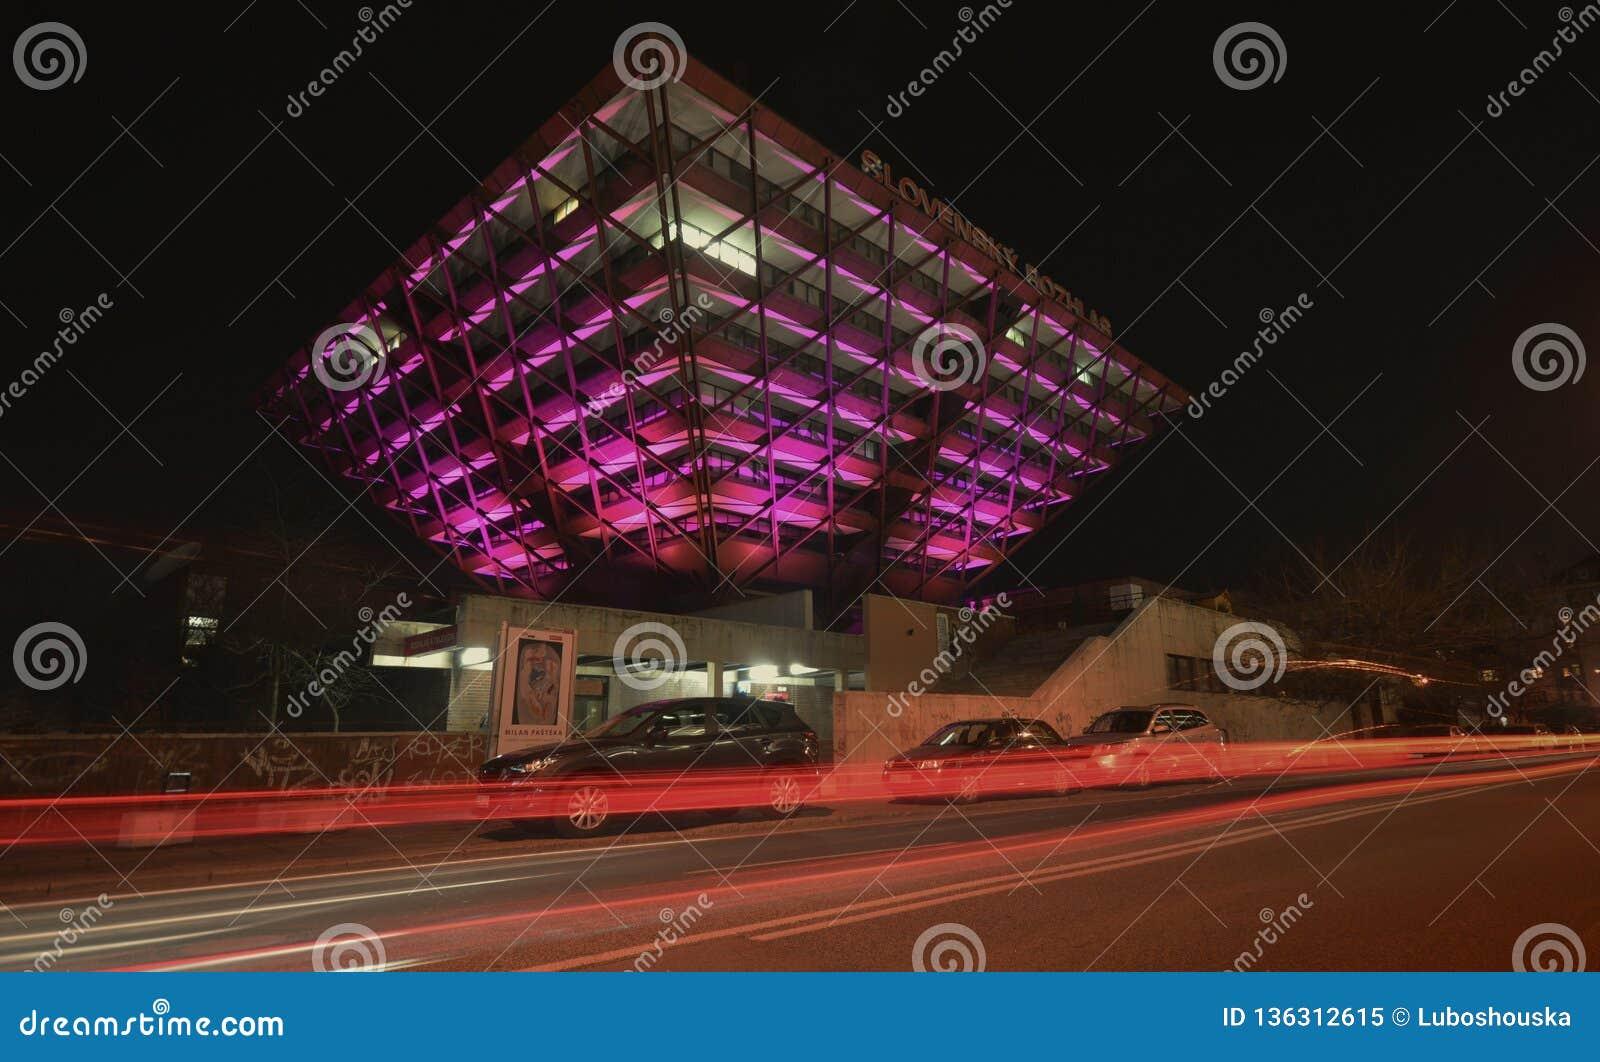 Slovak Radio Building at night.